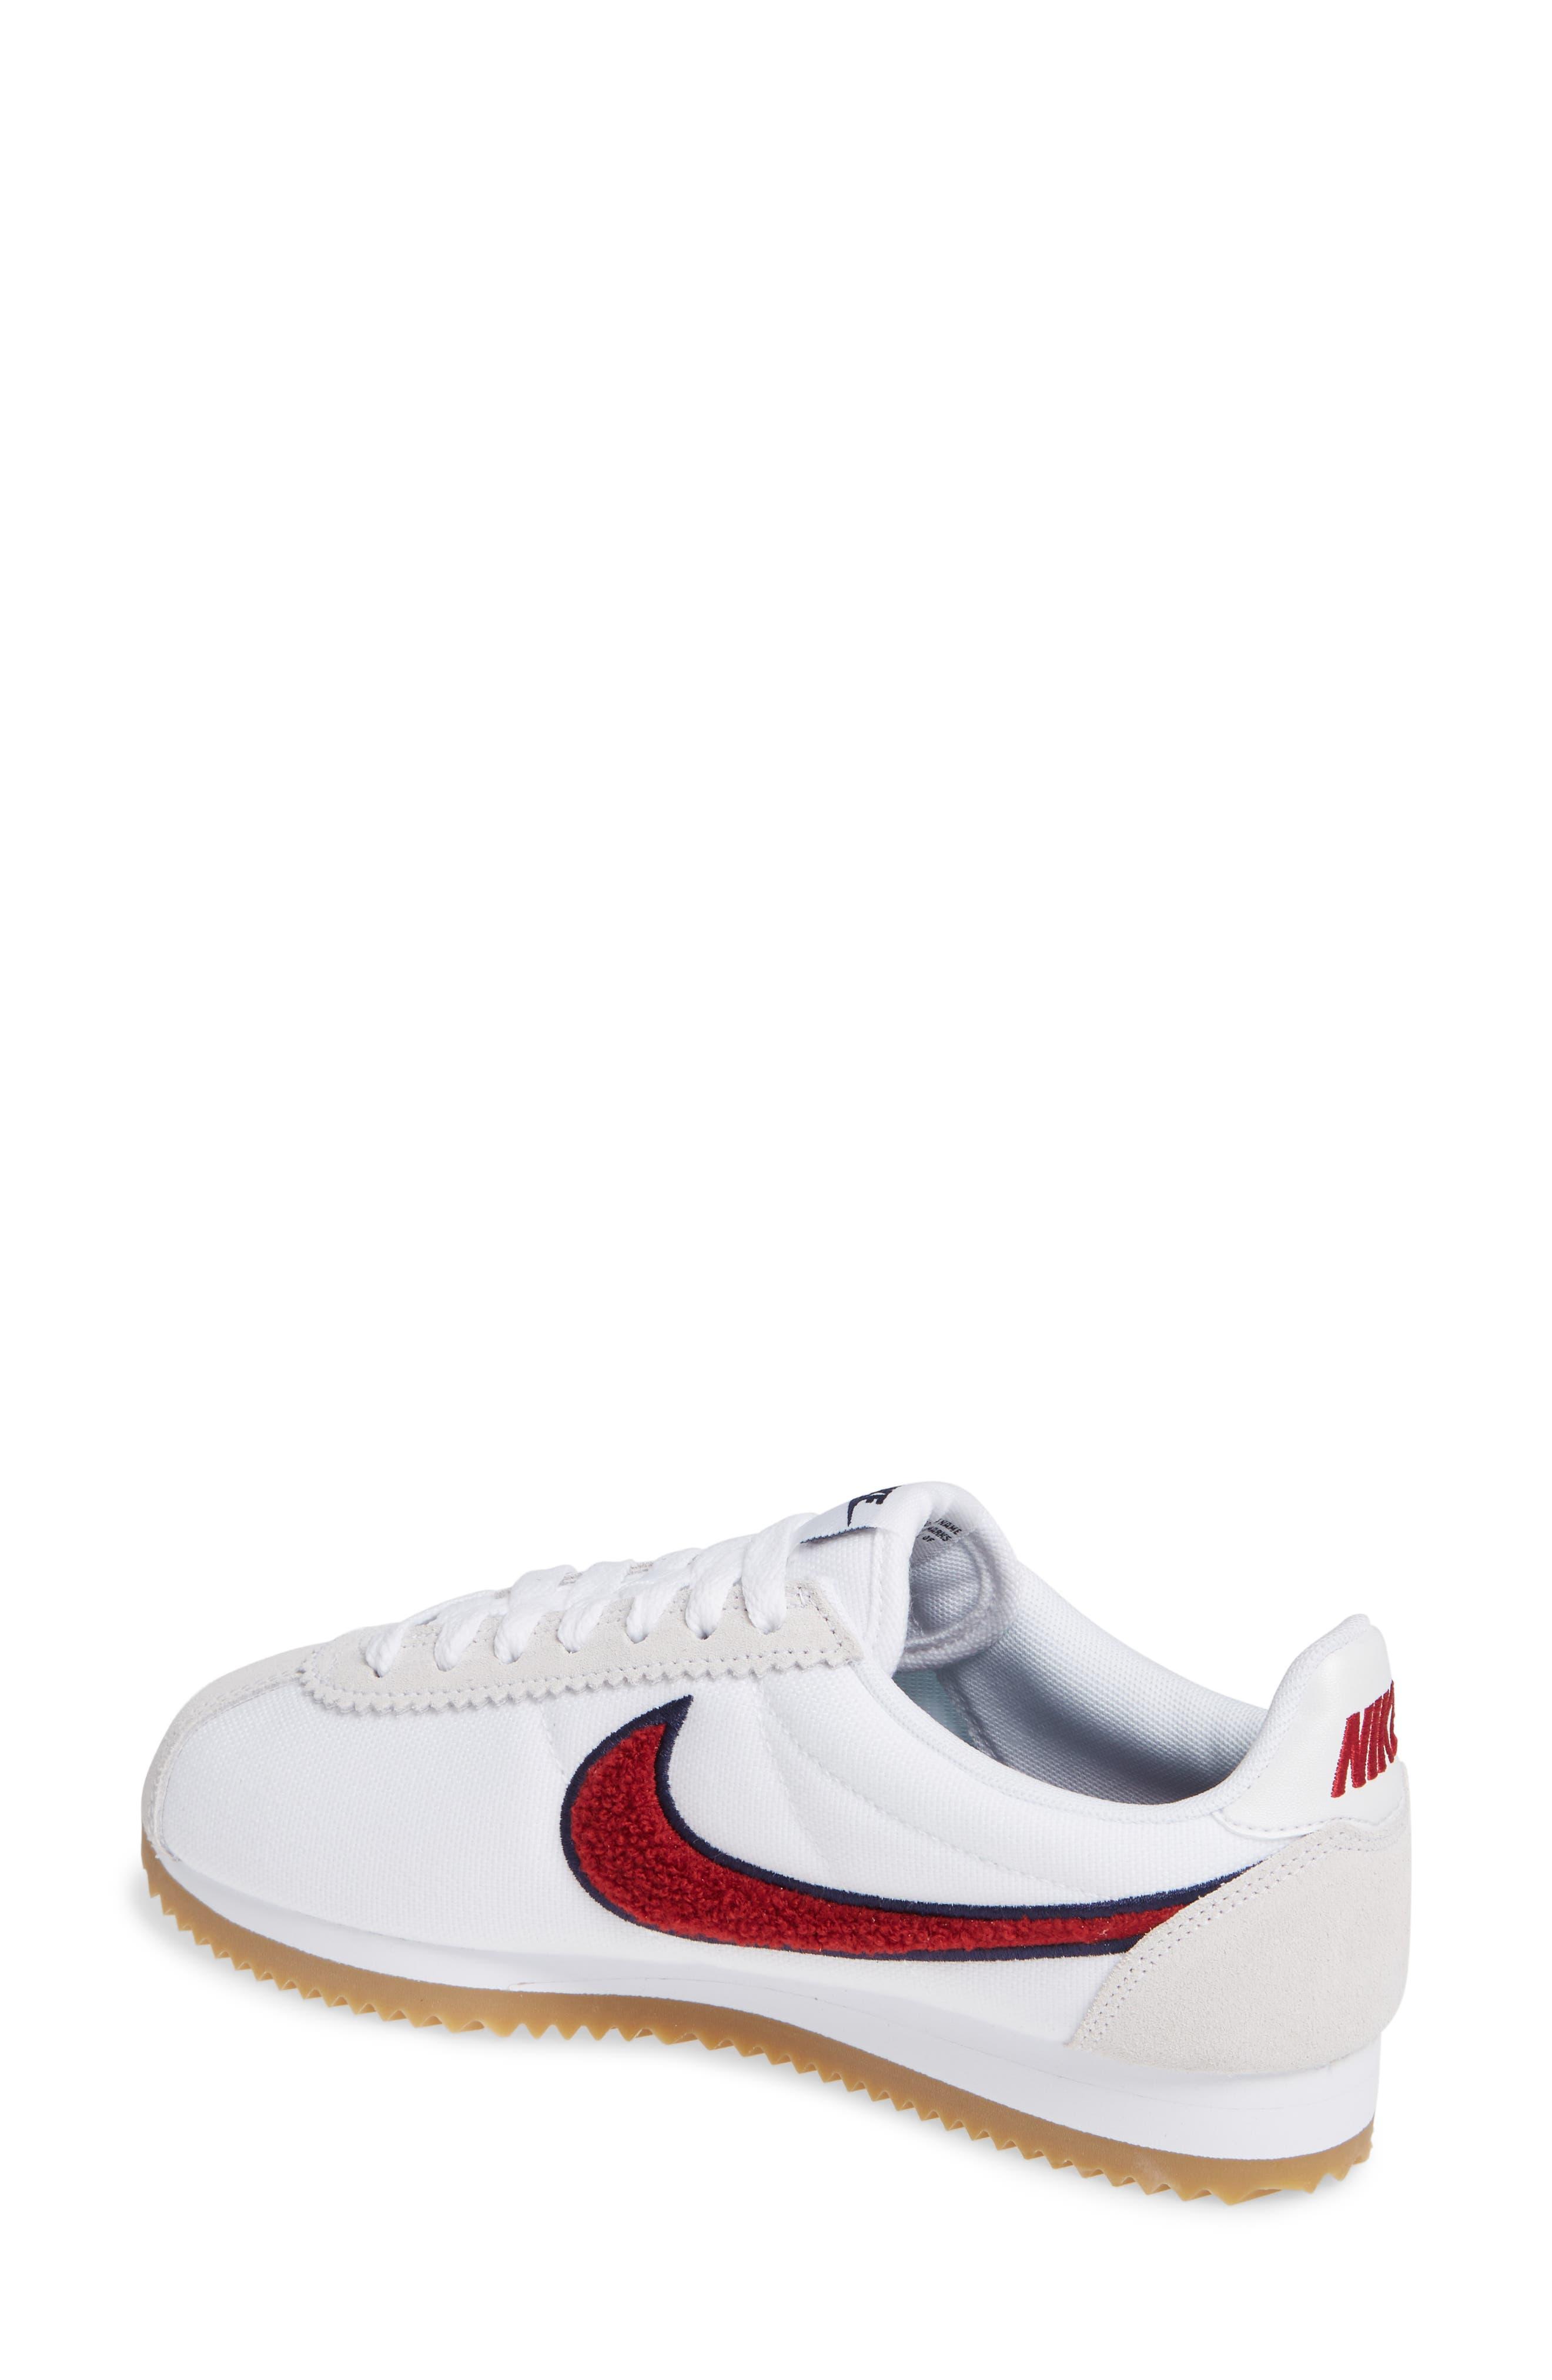 Classic Cortez Premium XLV Sneaker,                             Alternate thumbnail 2, color,                             WHITE/ RED CRUSH/ LIGHT BROWN